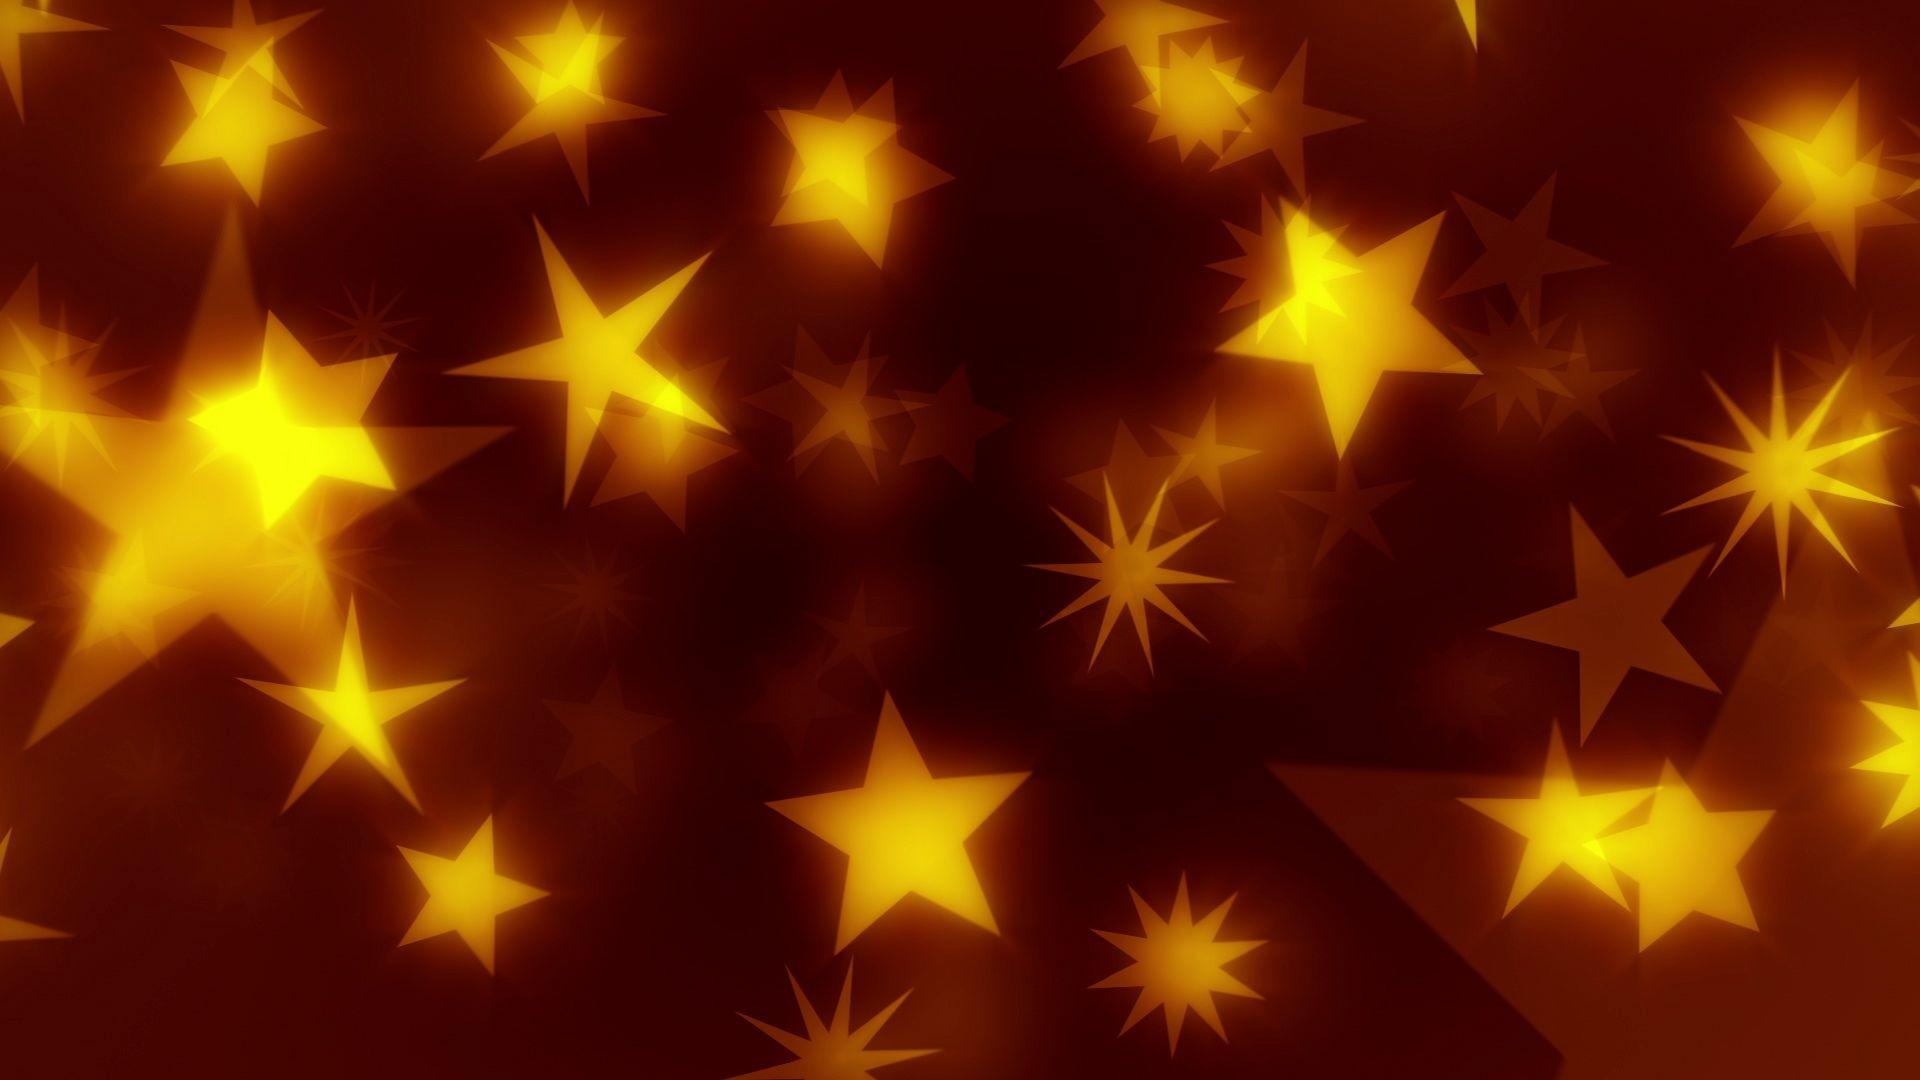 Christmas Star Background 183 ① Wallpapertag